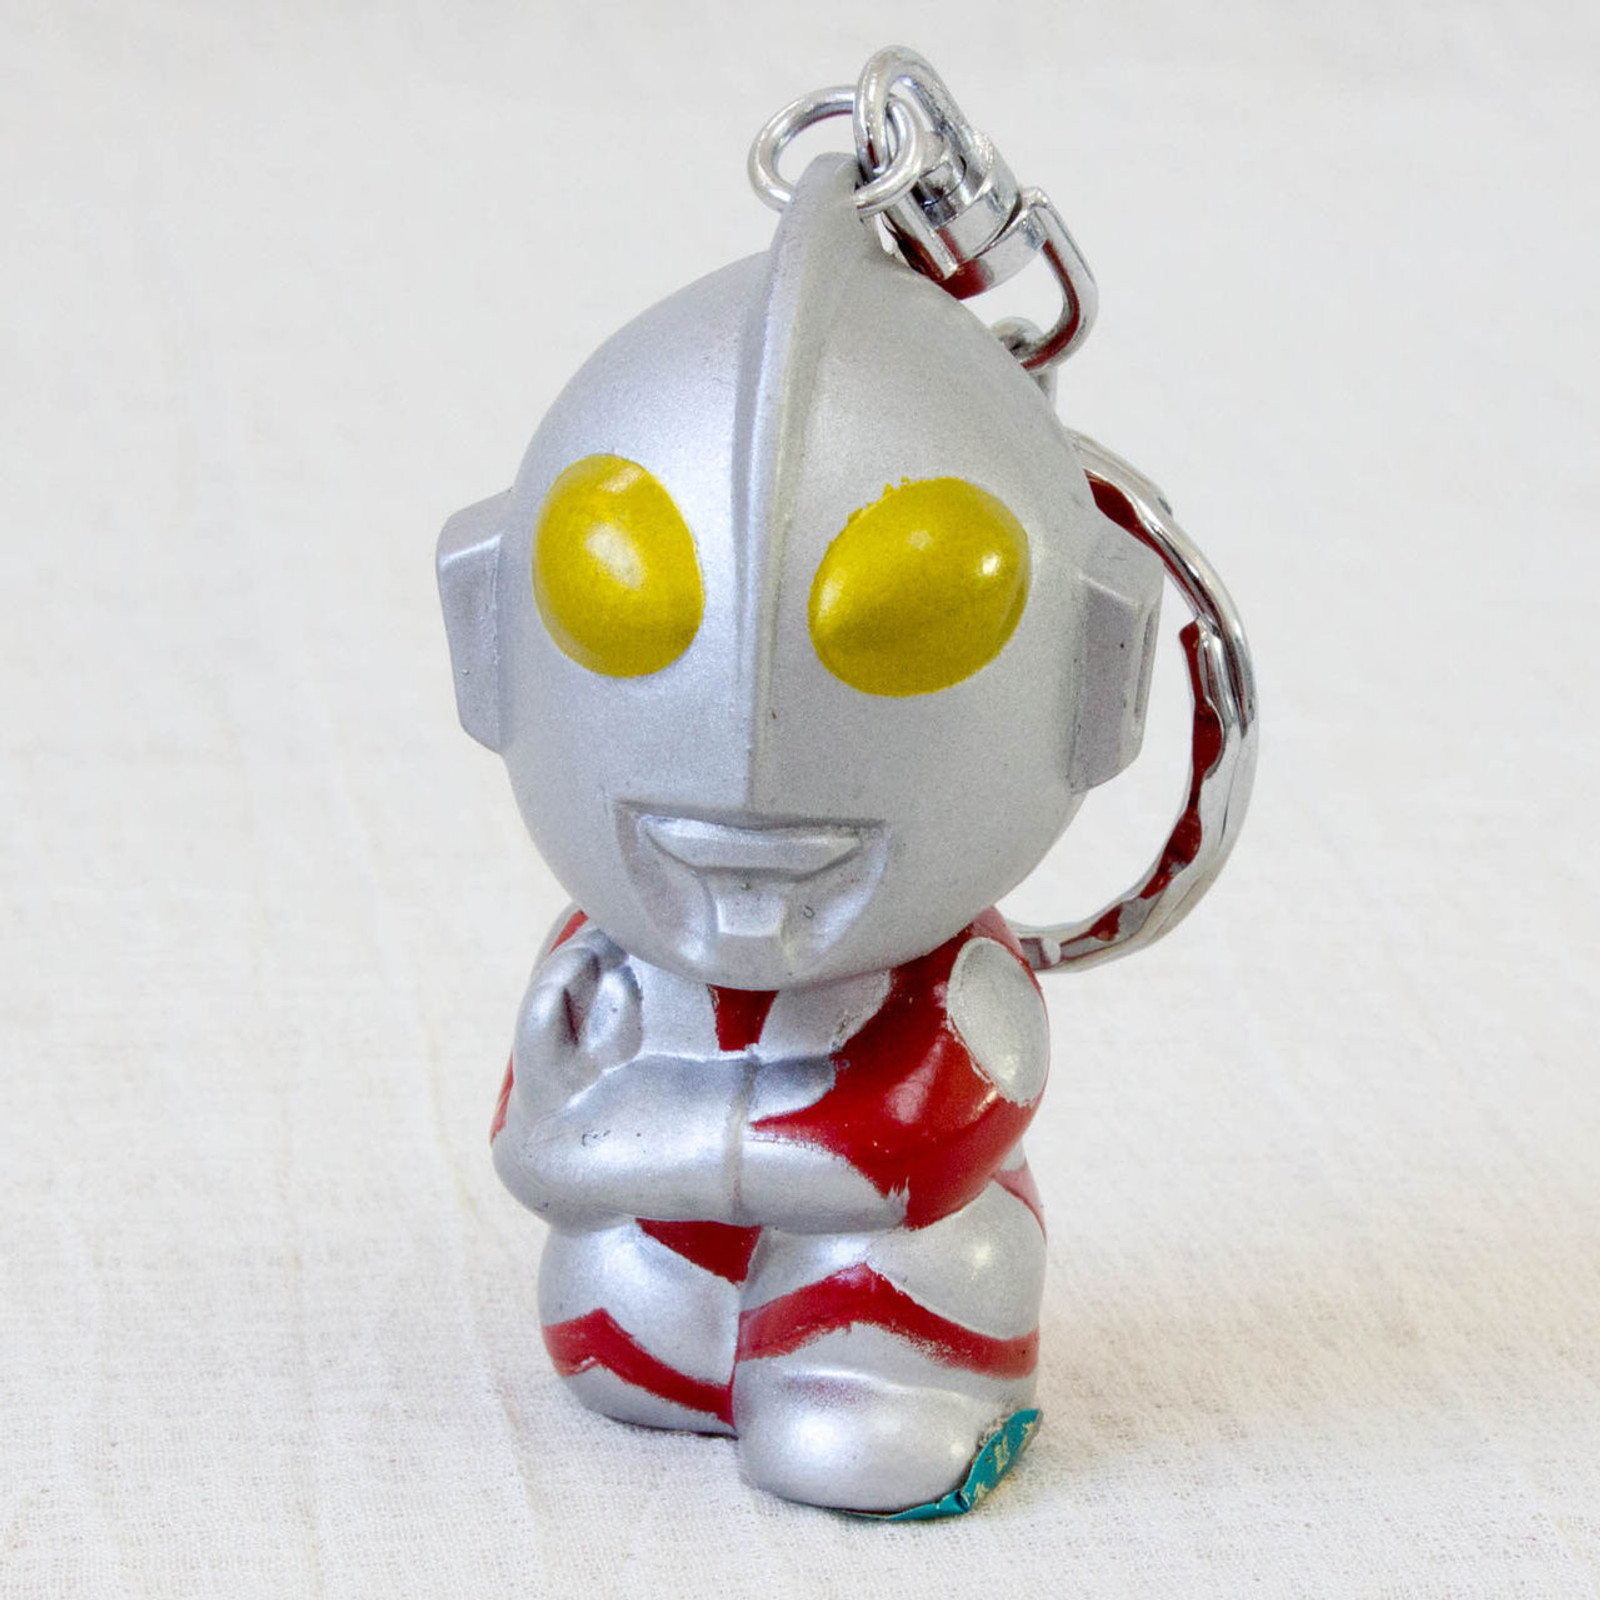 "Ultraman 2.5"" Figure Key Chain JAPAN TOKUSATSU ANIME"